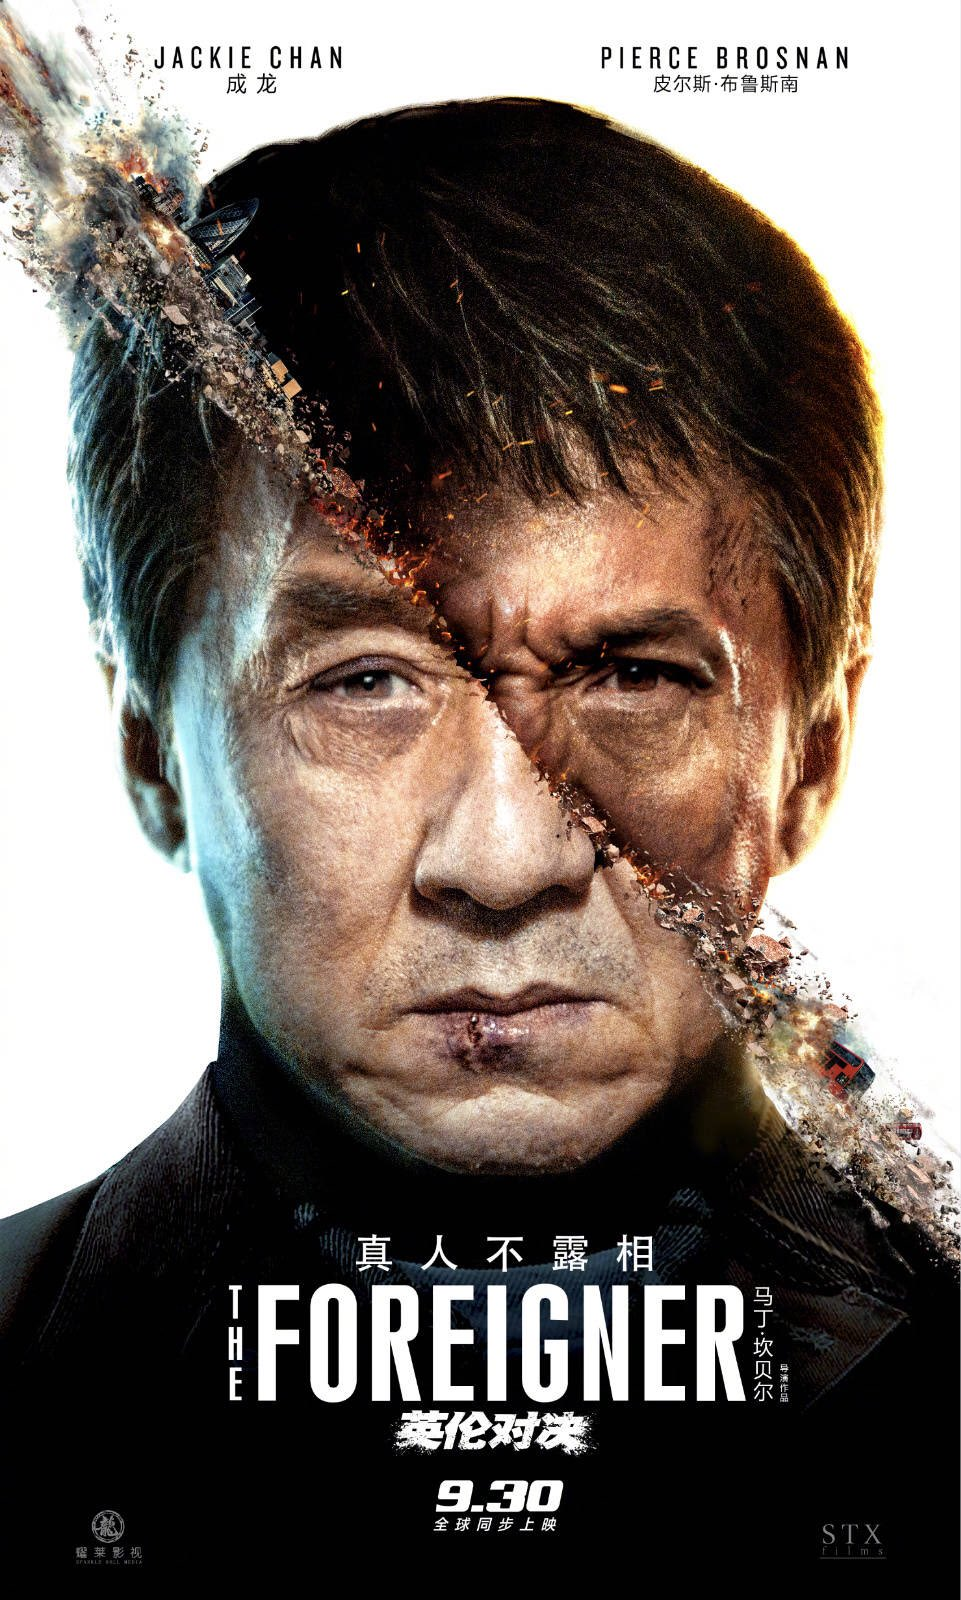 Jackie Chan Filme Liste